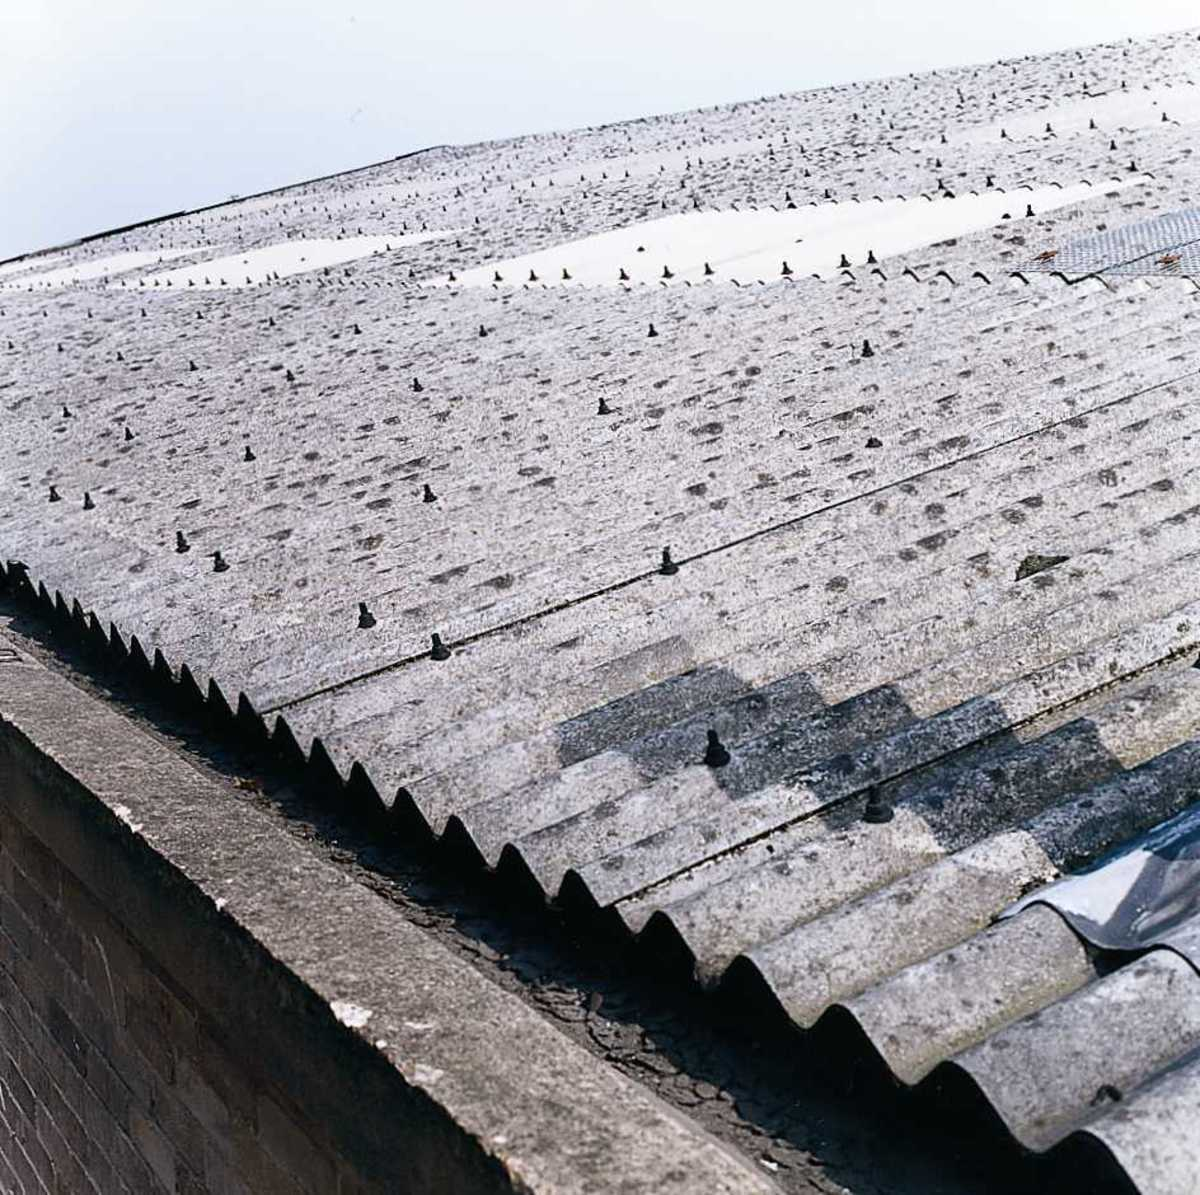 Asbestos awareness course practice test mock questions for the uk asbestos awareness course practice test mock questions for the uk ukata exam toughnickel dailygadgetfo Images